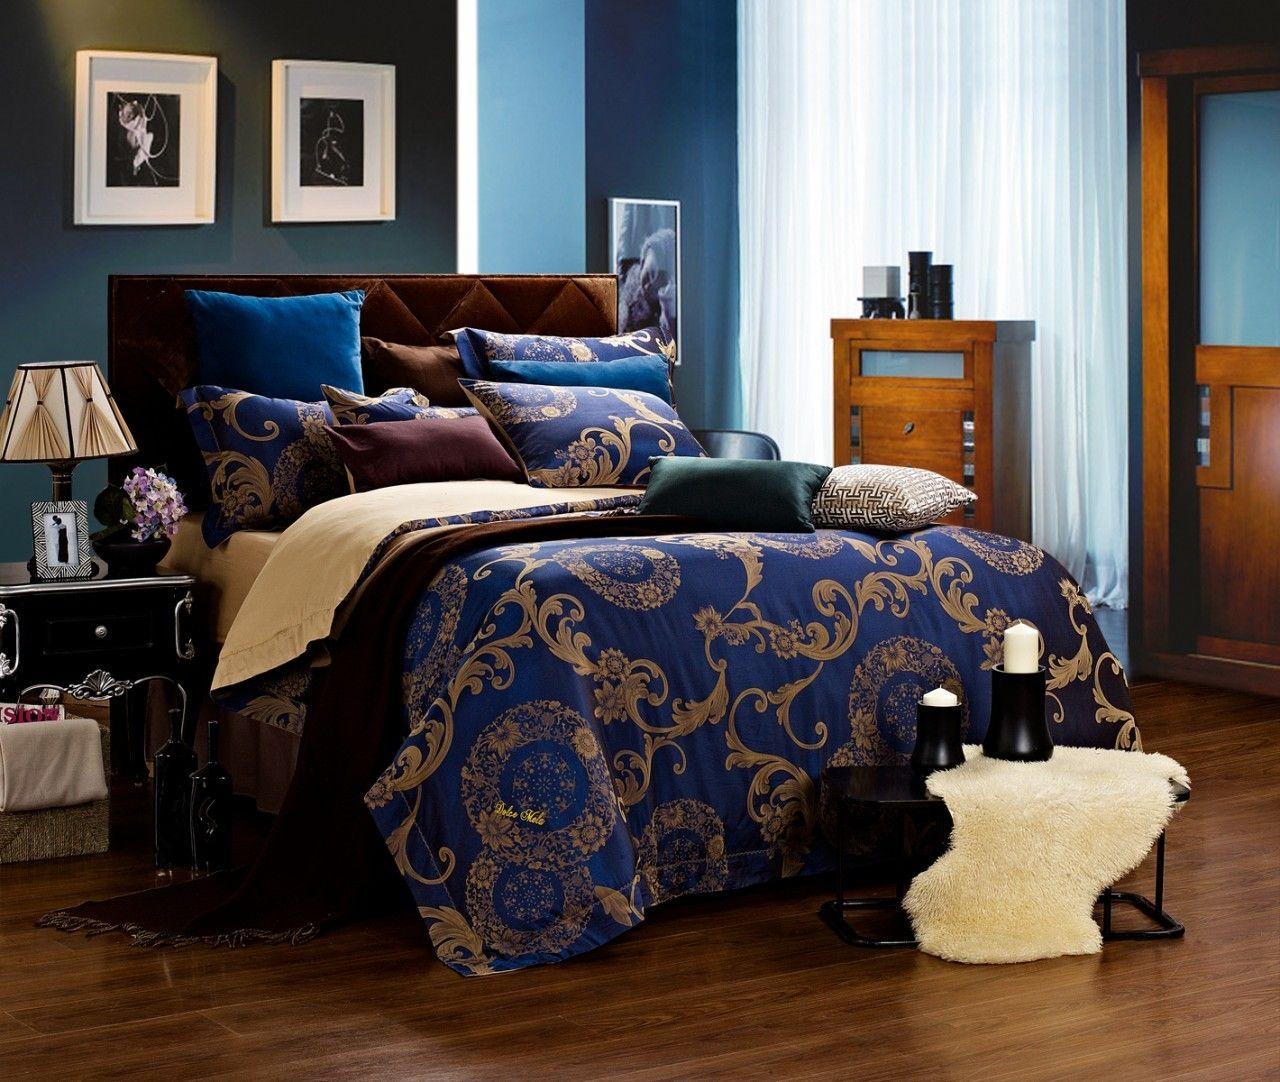 Neutral Modern Queen Quilted Silk Duvet Cover Luxury